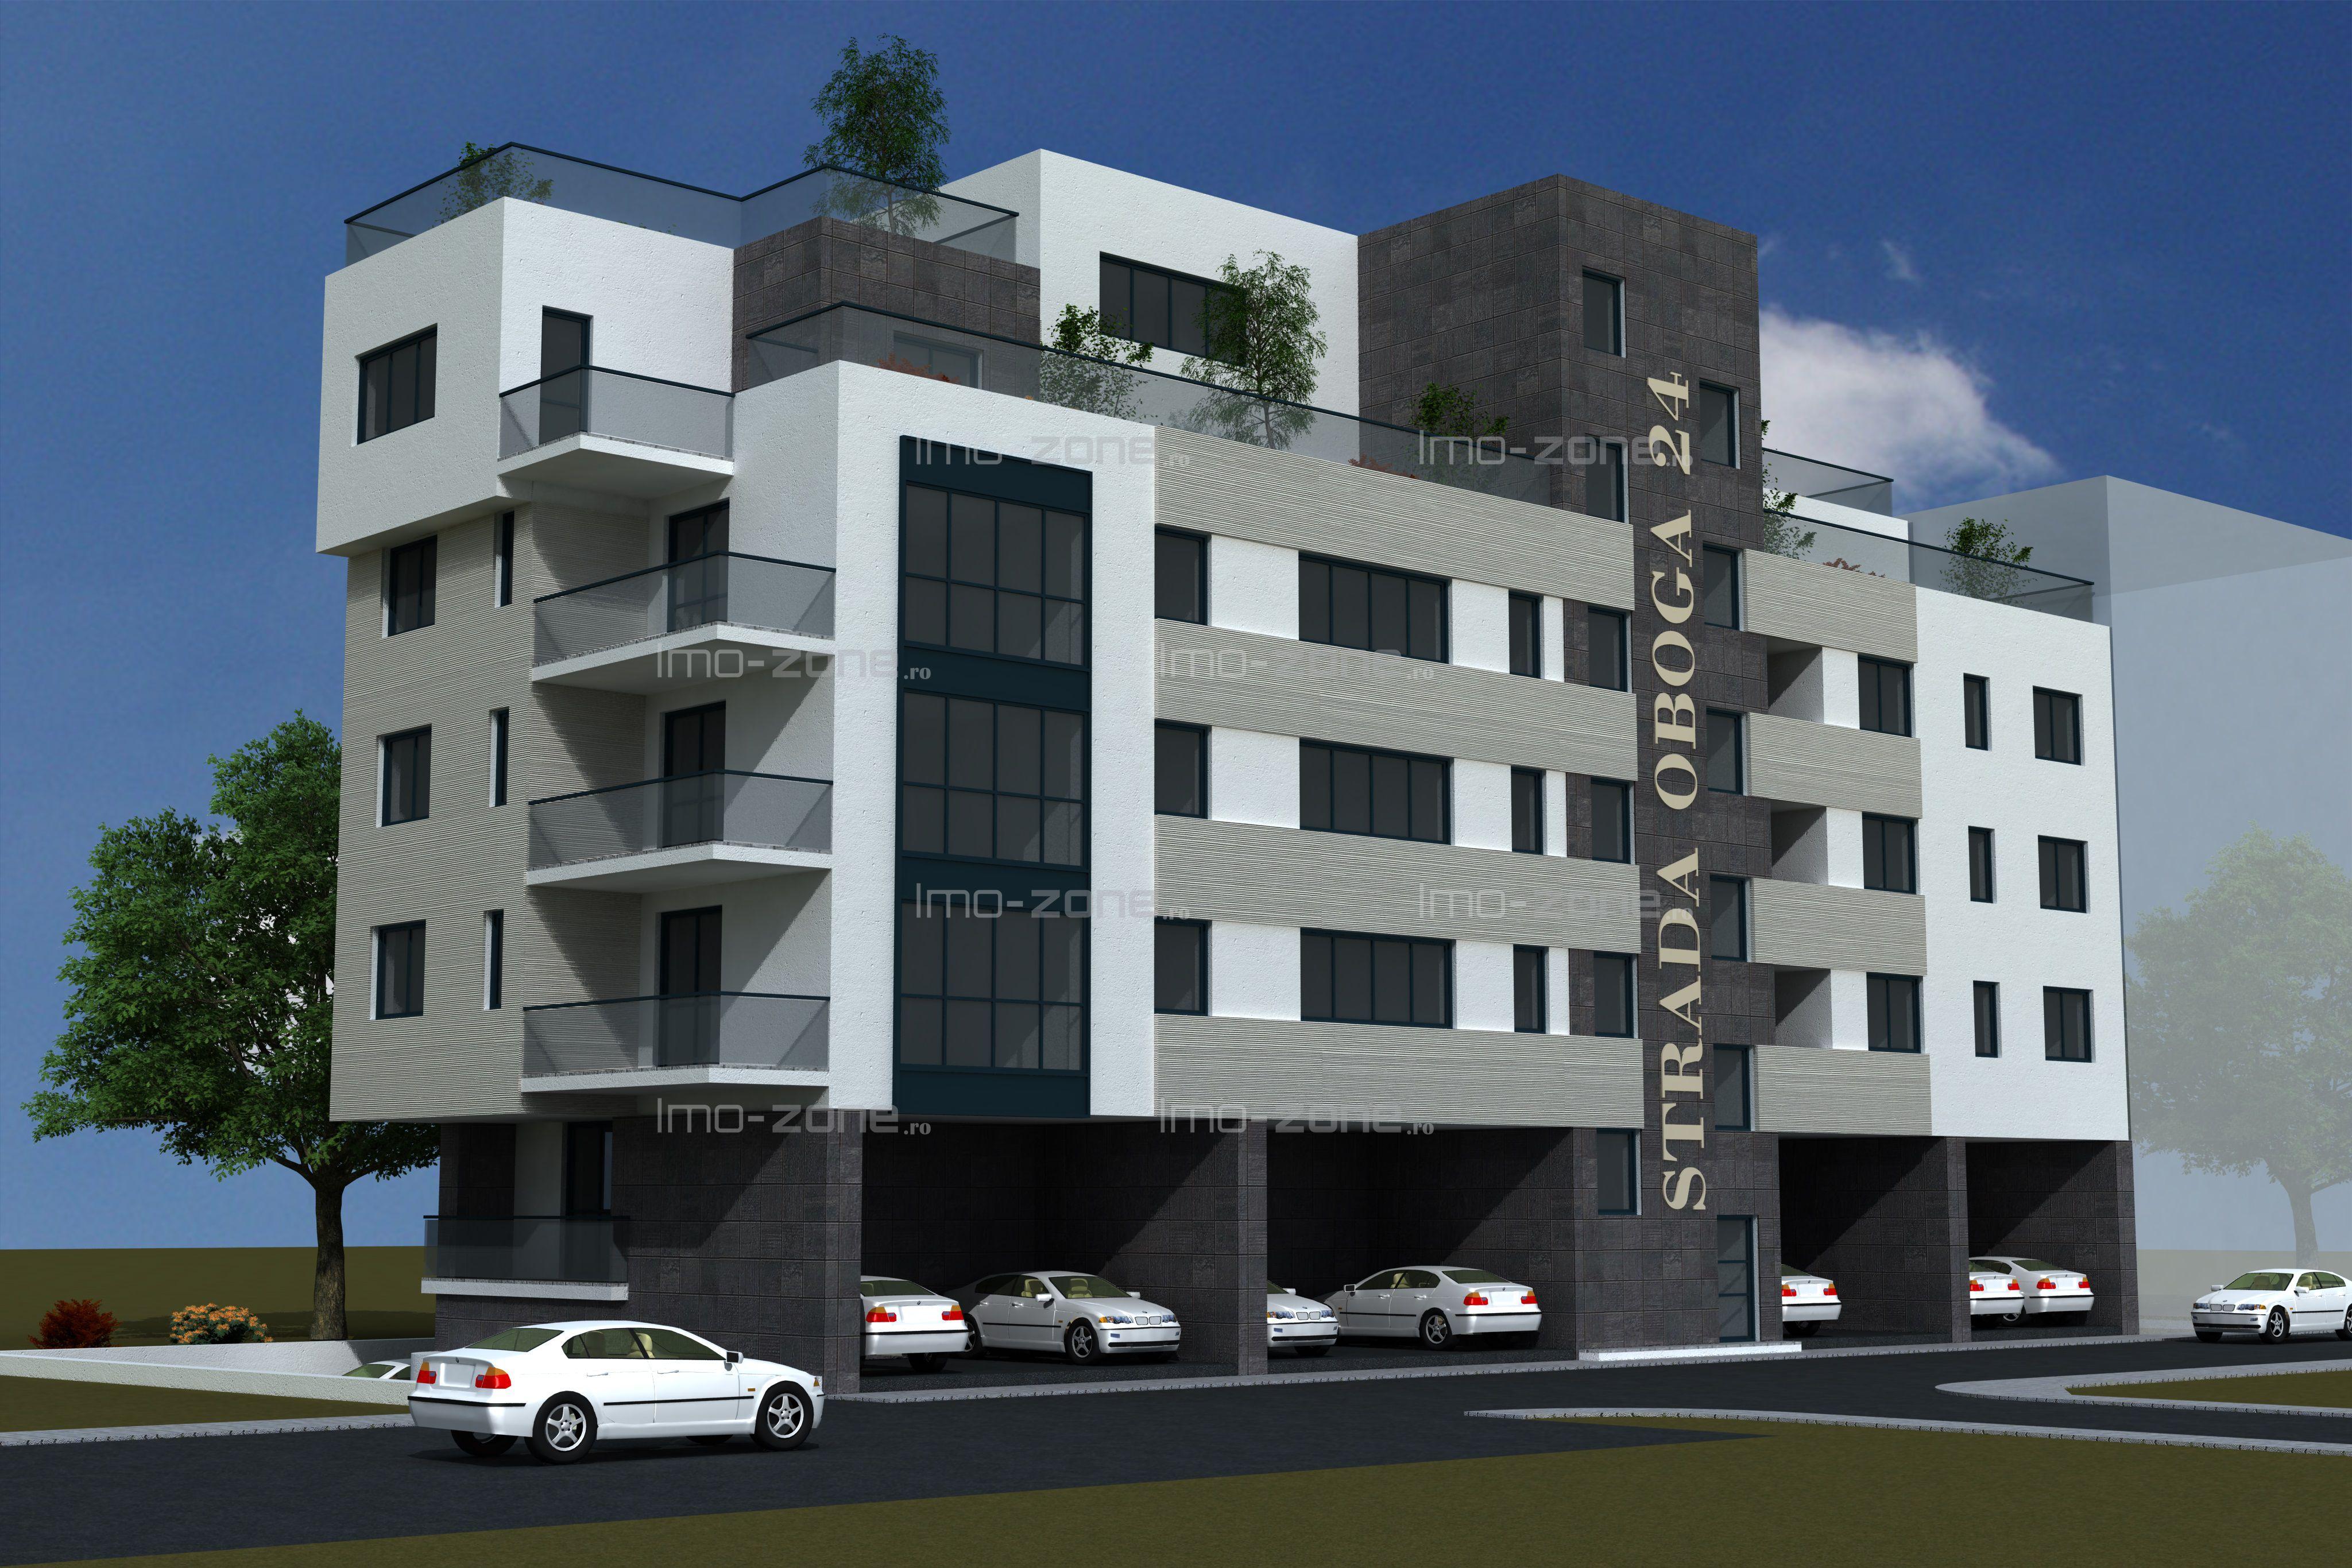 COMISION 0%, apartament 3 camere, decomandat, 2 bai, metrou 4 minute Pacii